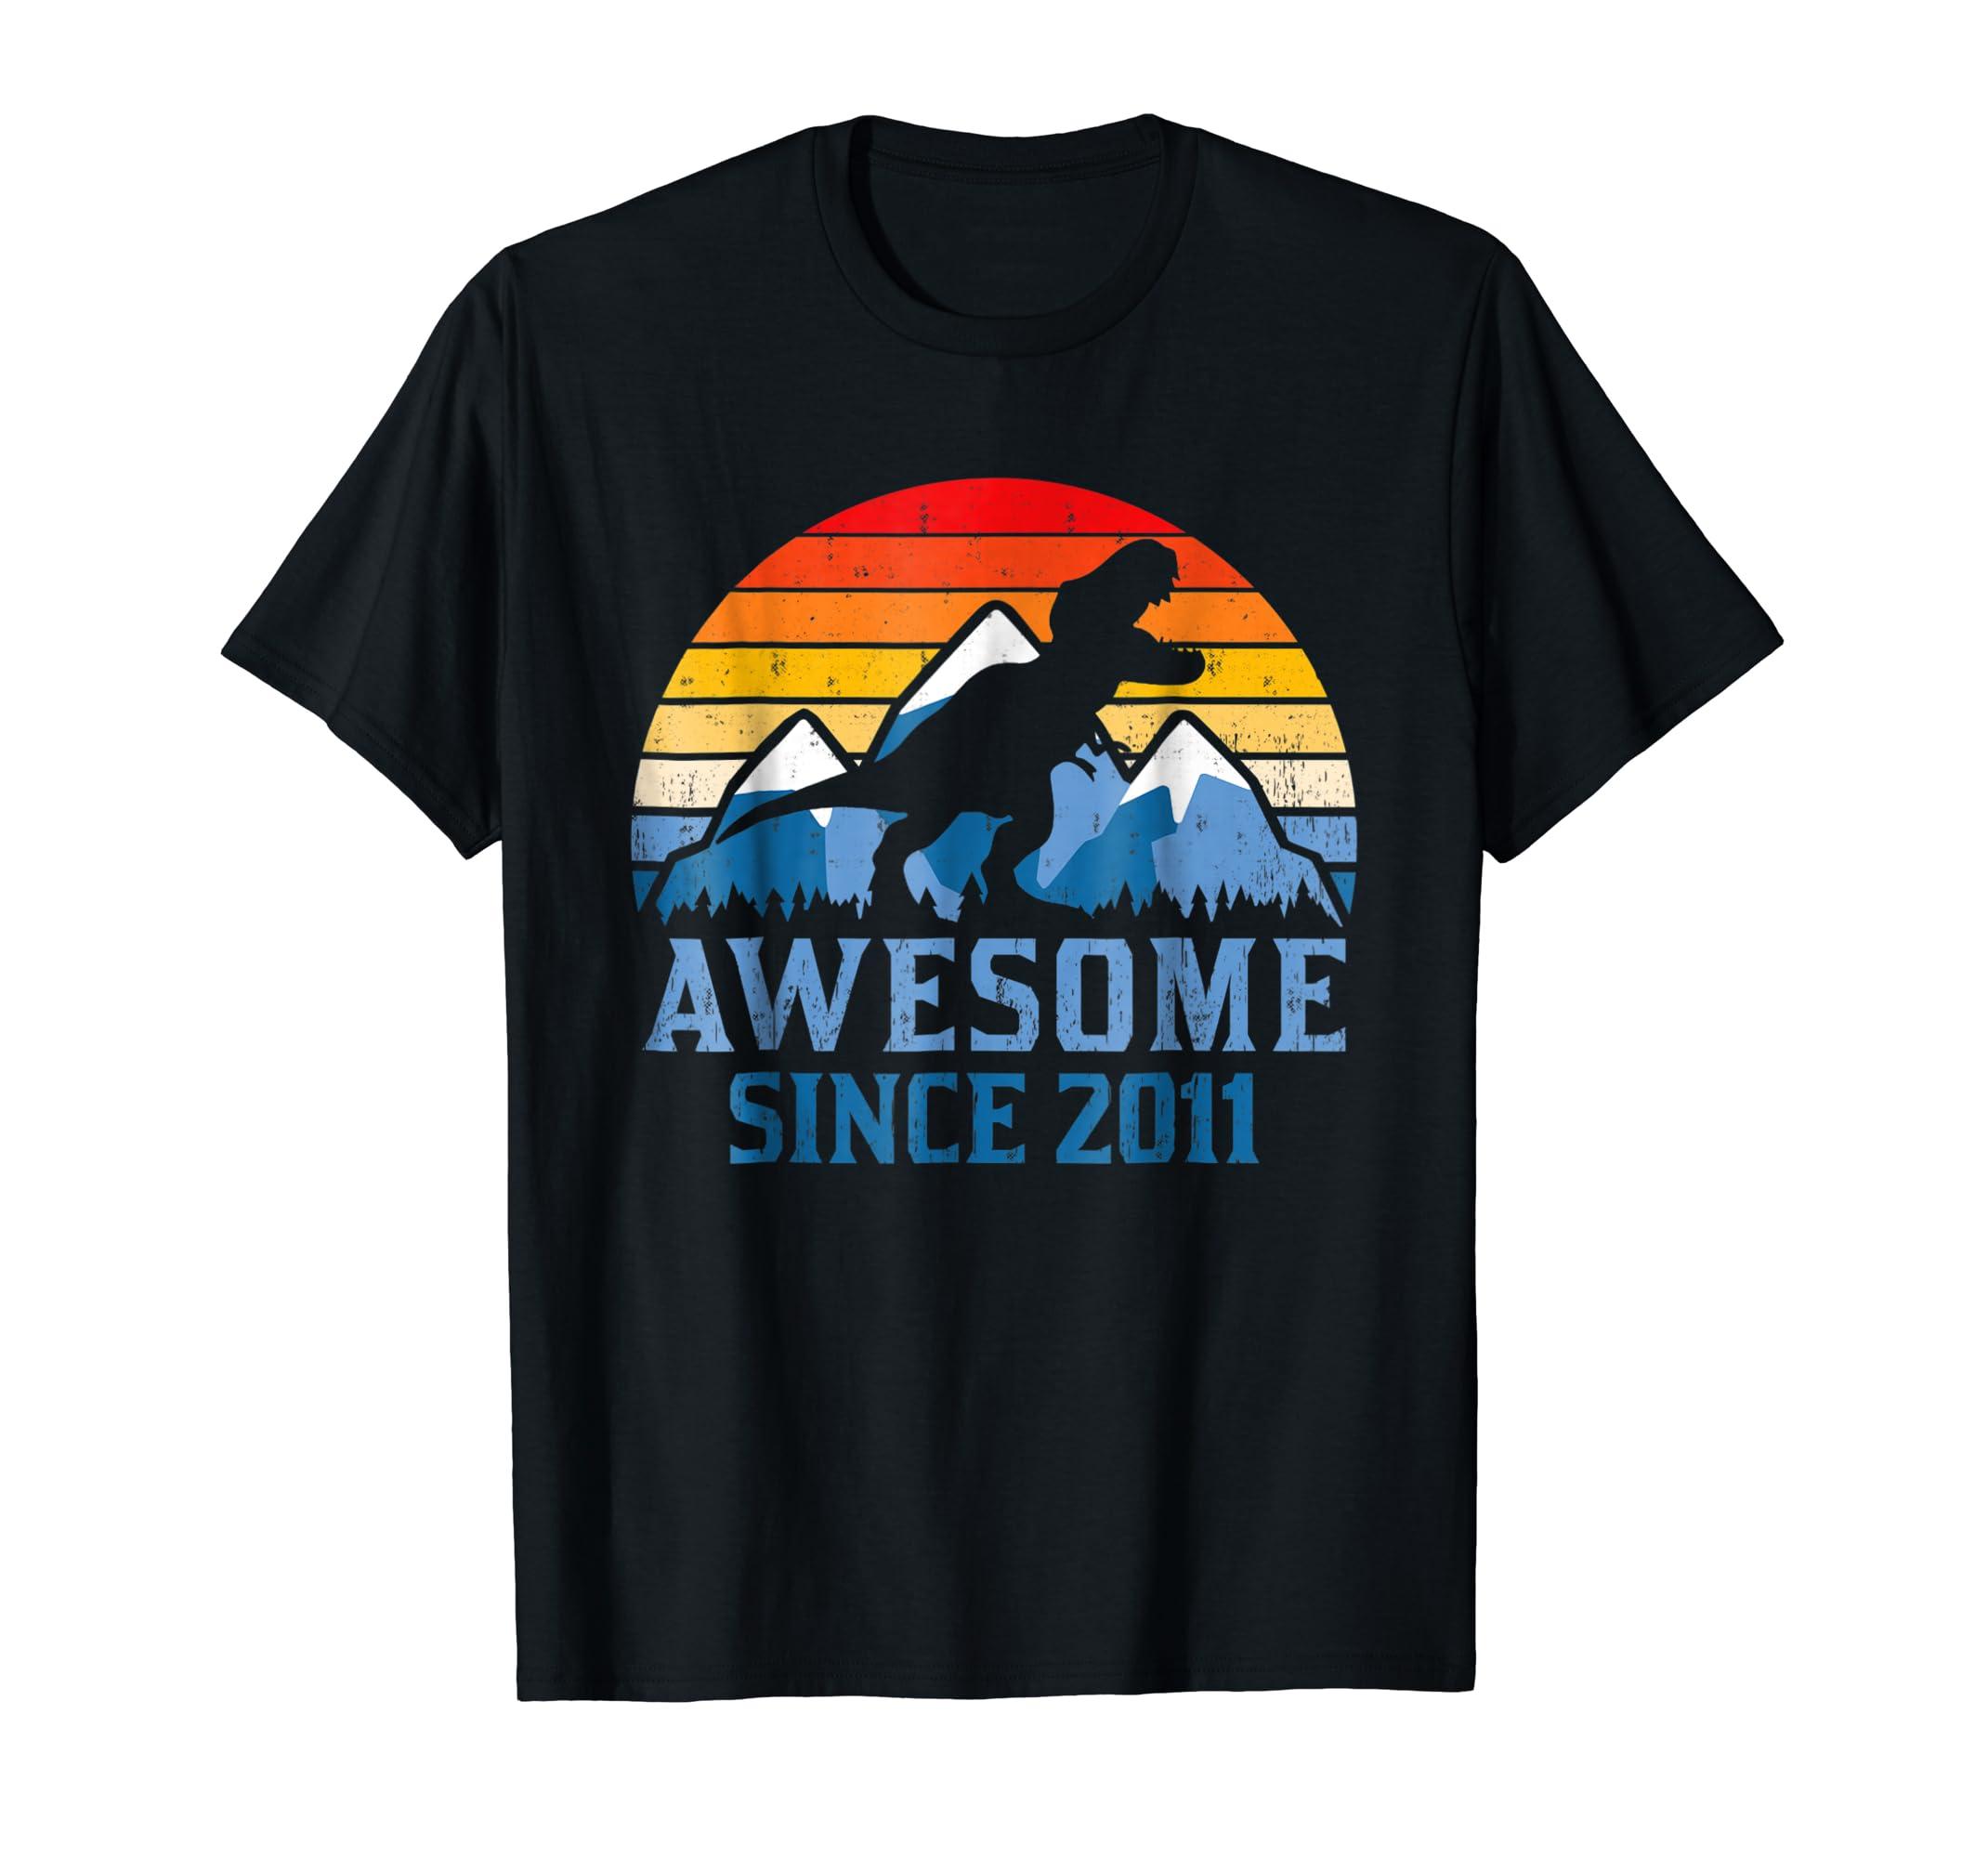 7th Birthday Gift Shirt Dinosaur 7 Year Old Tshirt For Boy Teechatpro